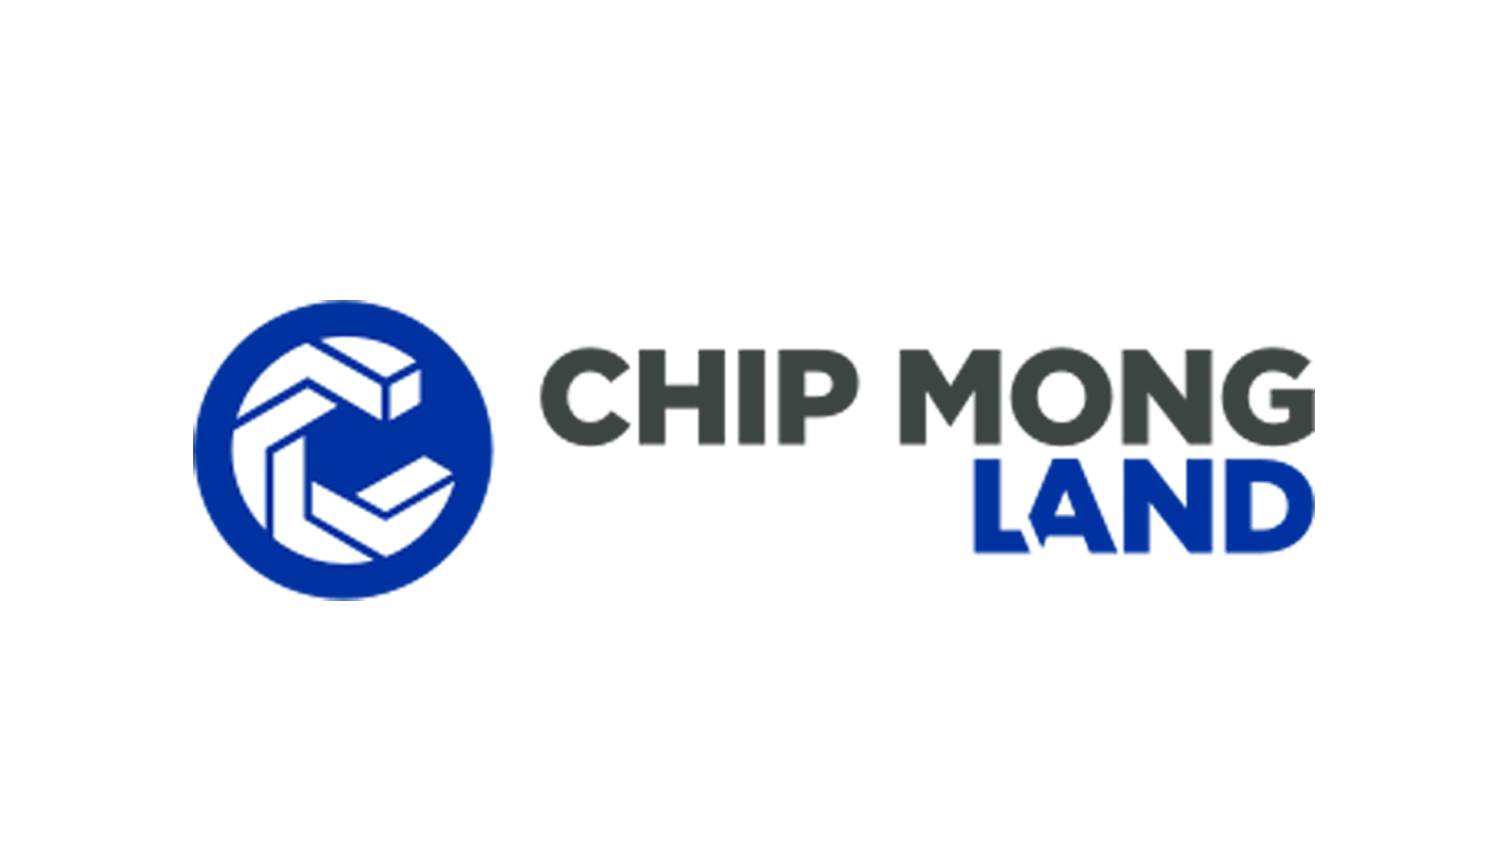 Chip Mong Land